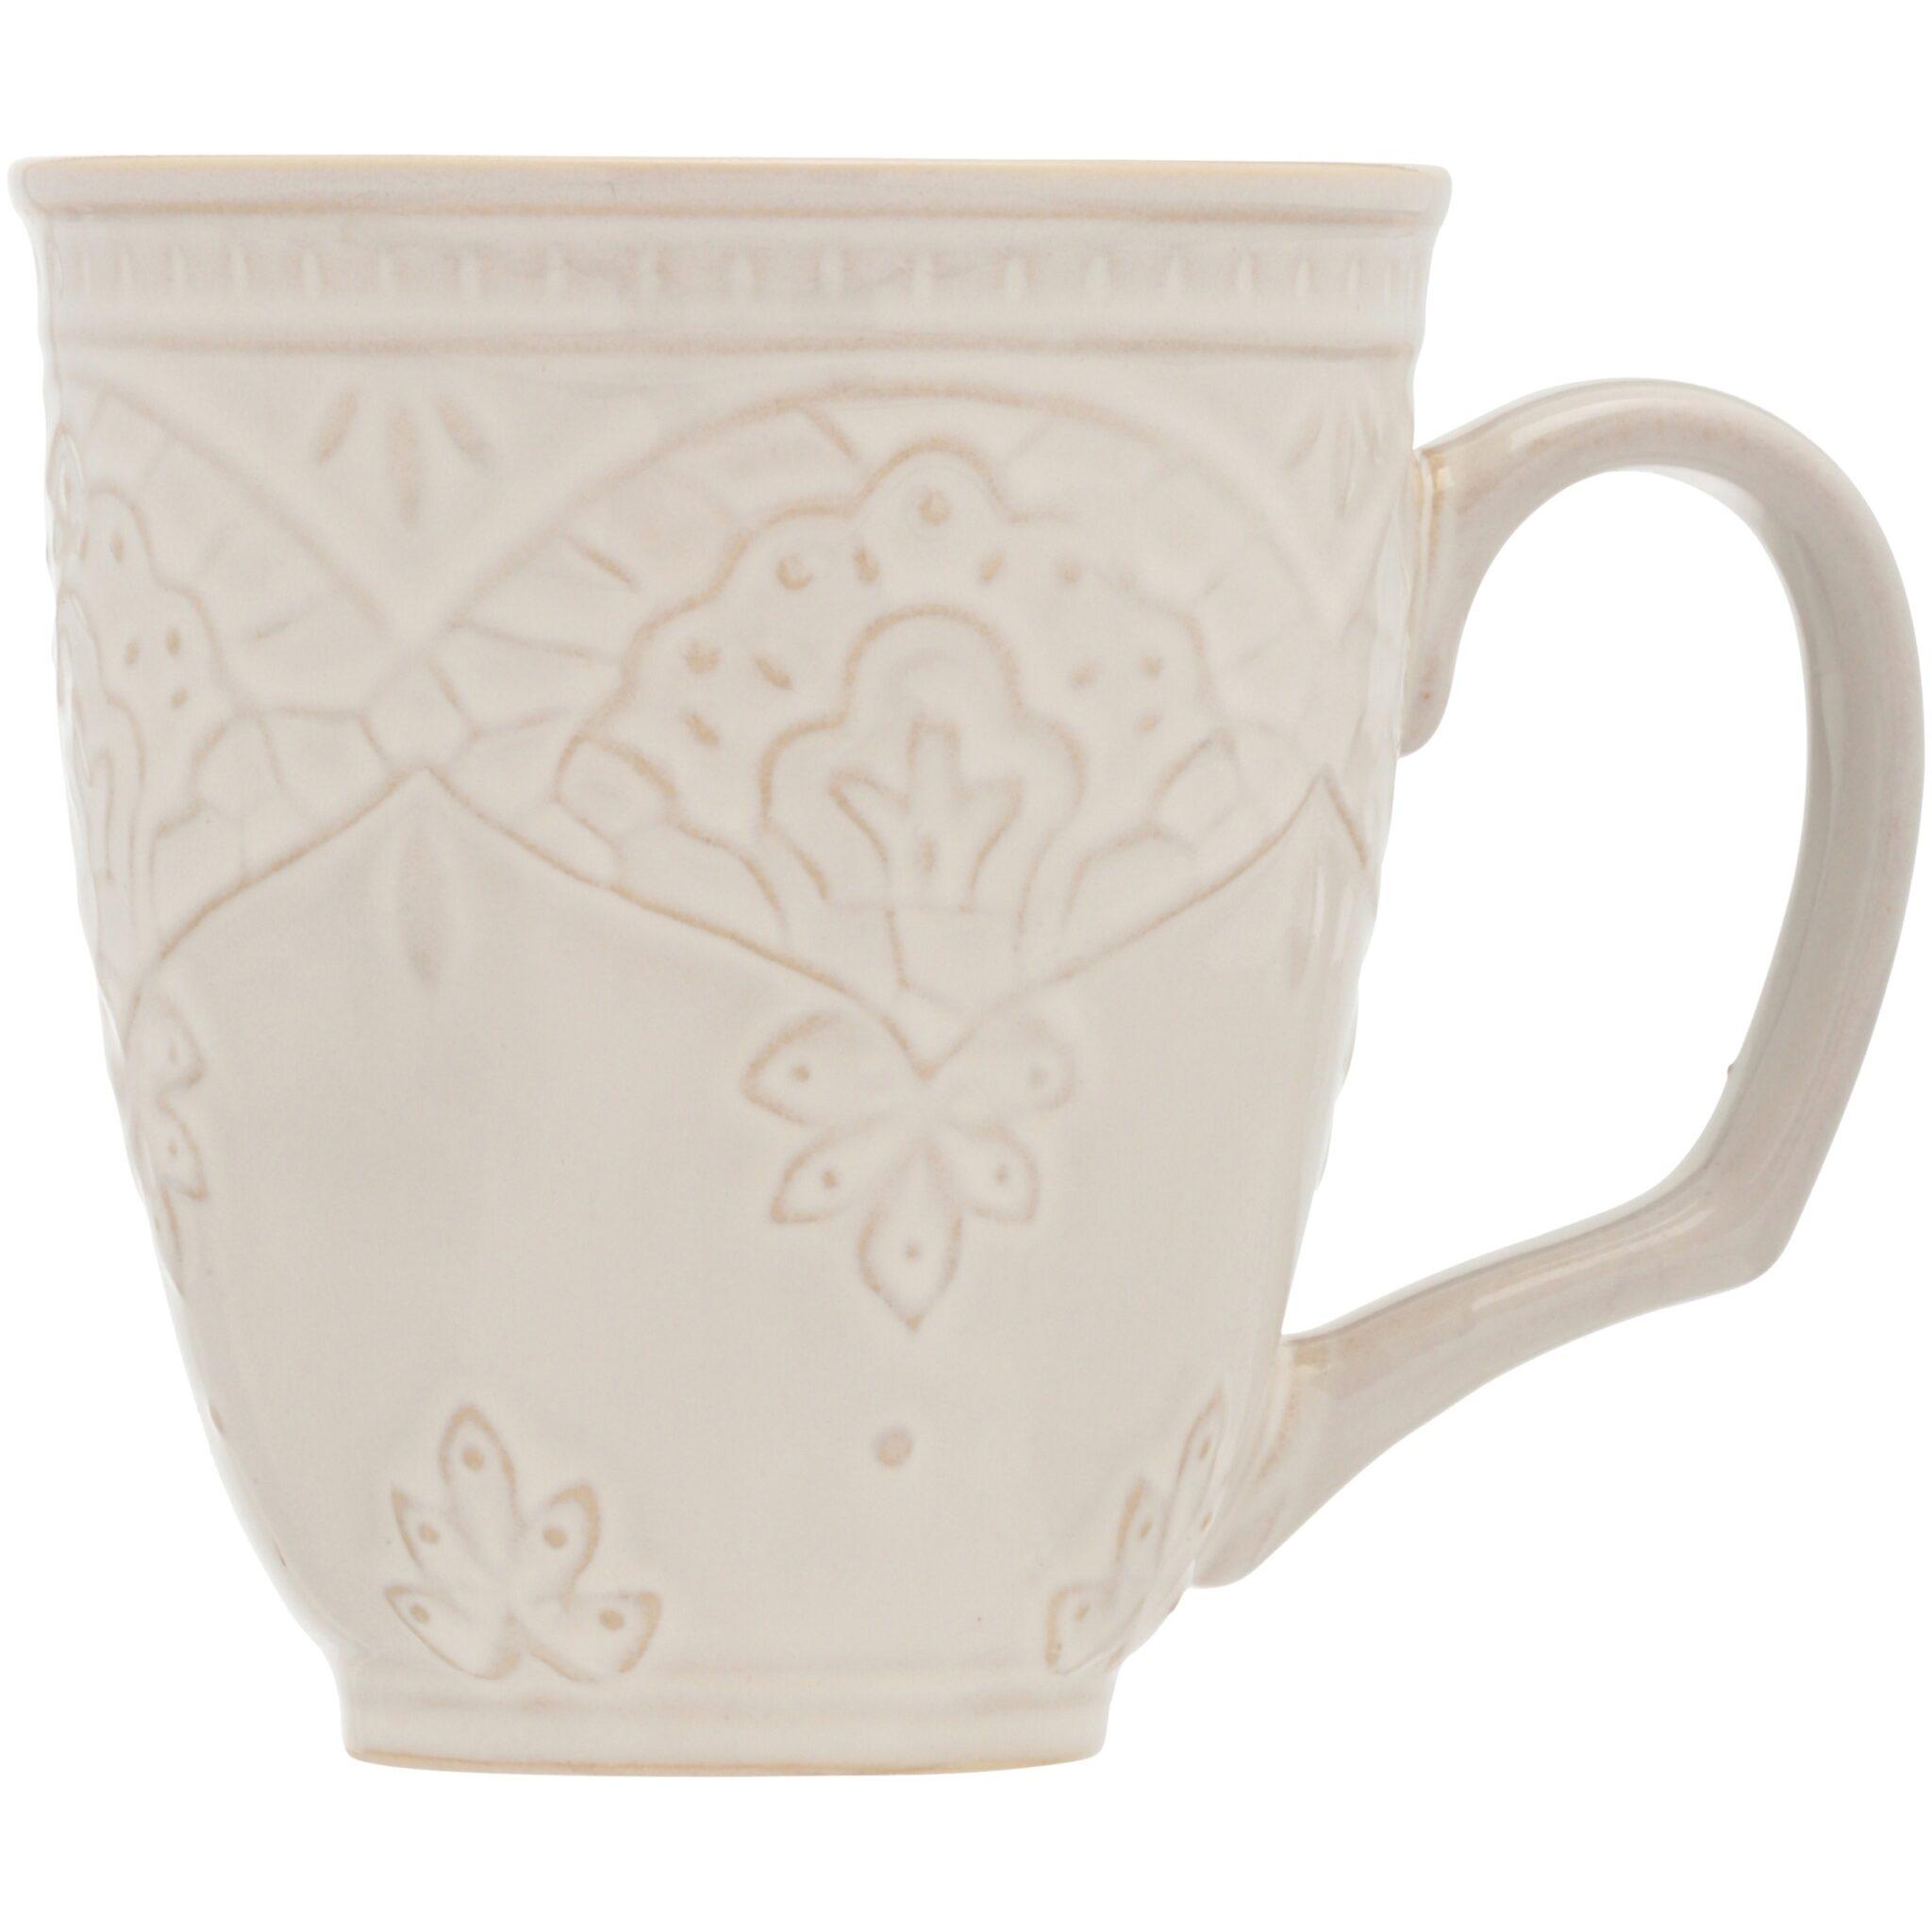 The Pioneer Woman Farmhouse Lace 4-Piece 17-Ounce Mug Set, Off White $15.98